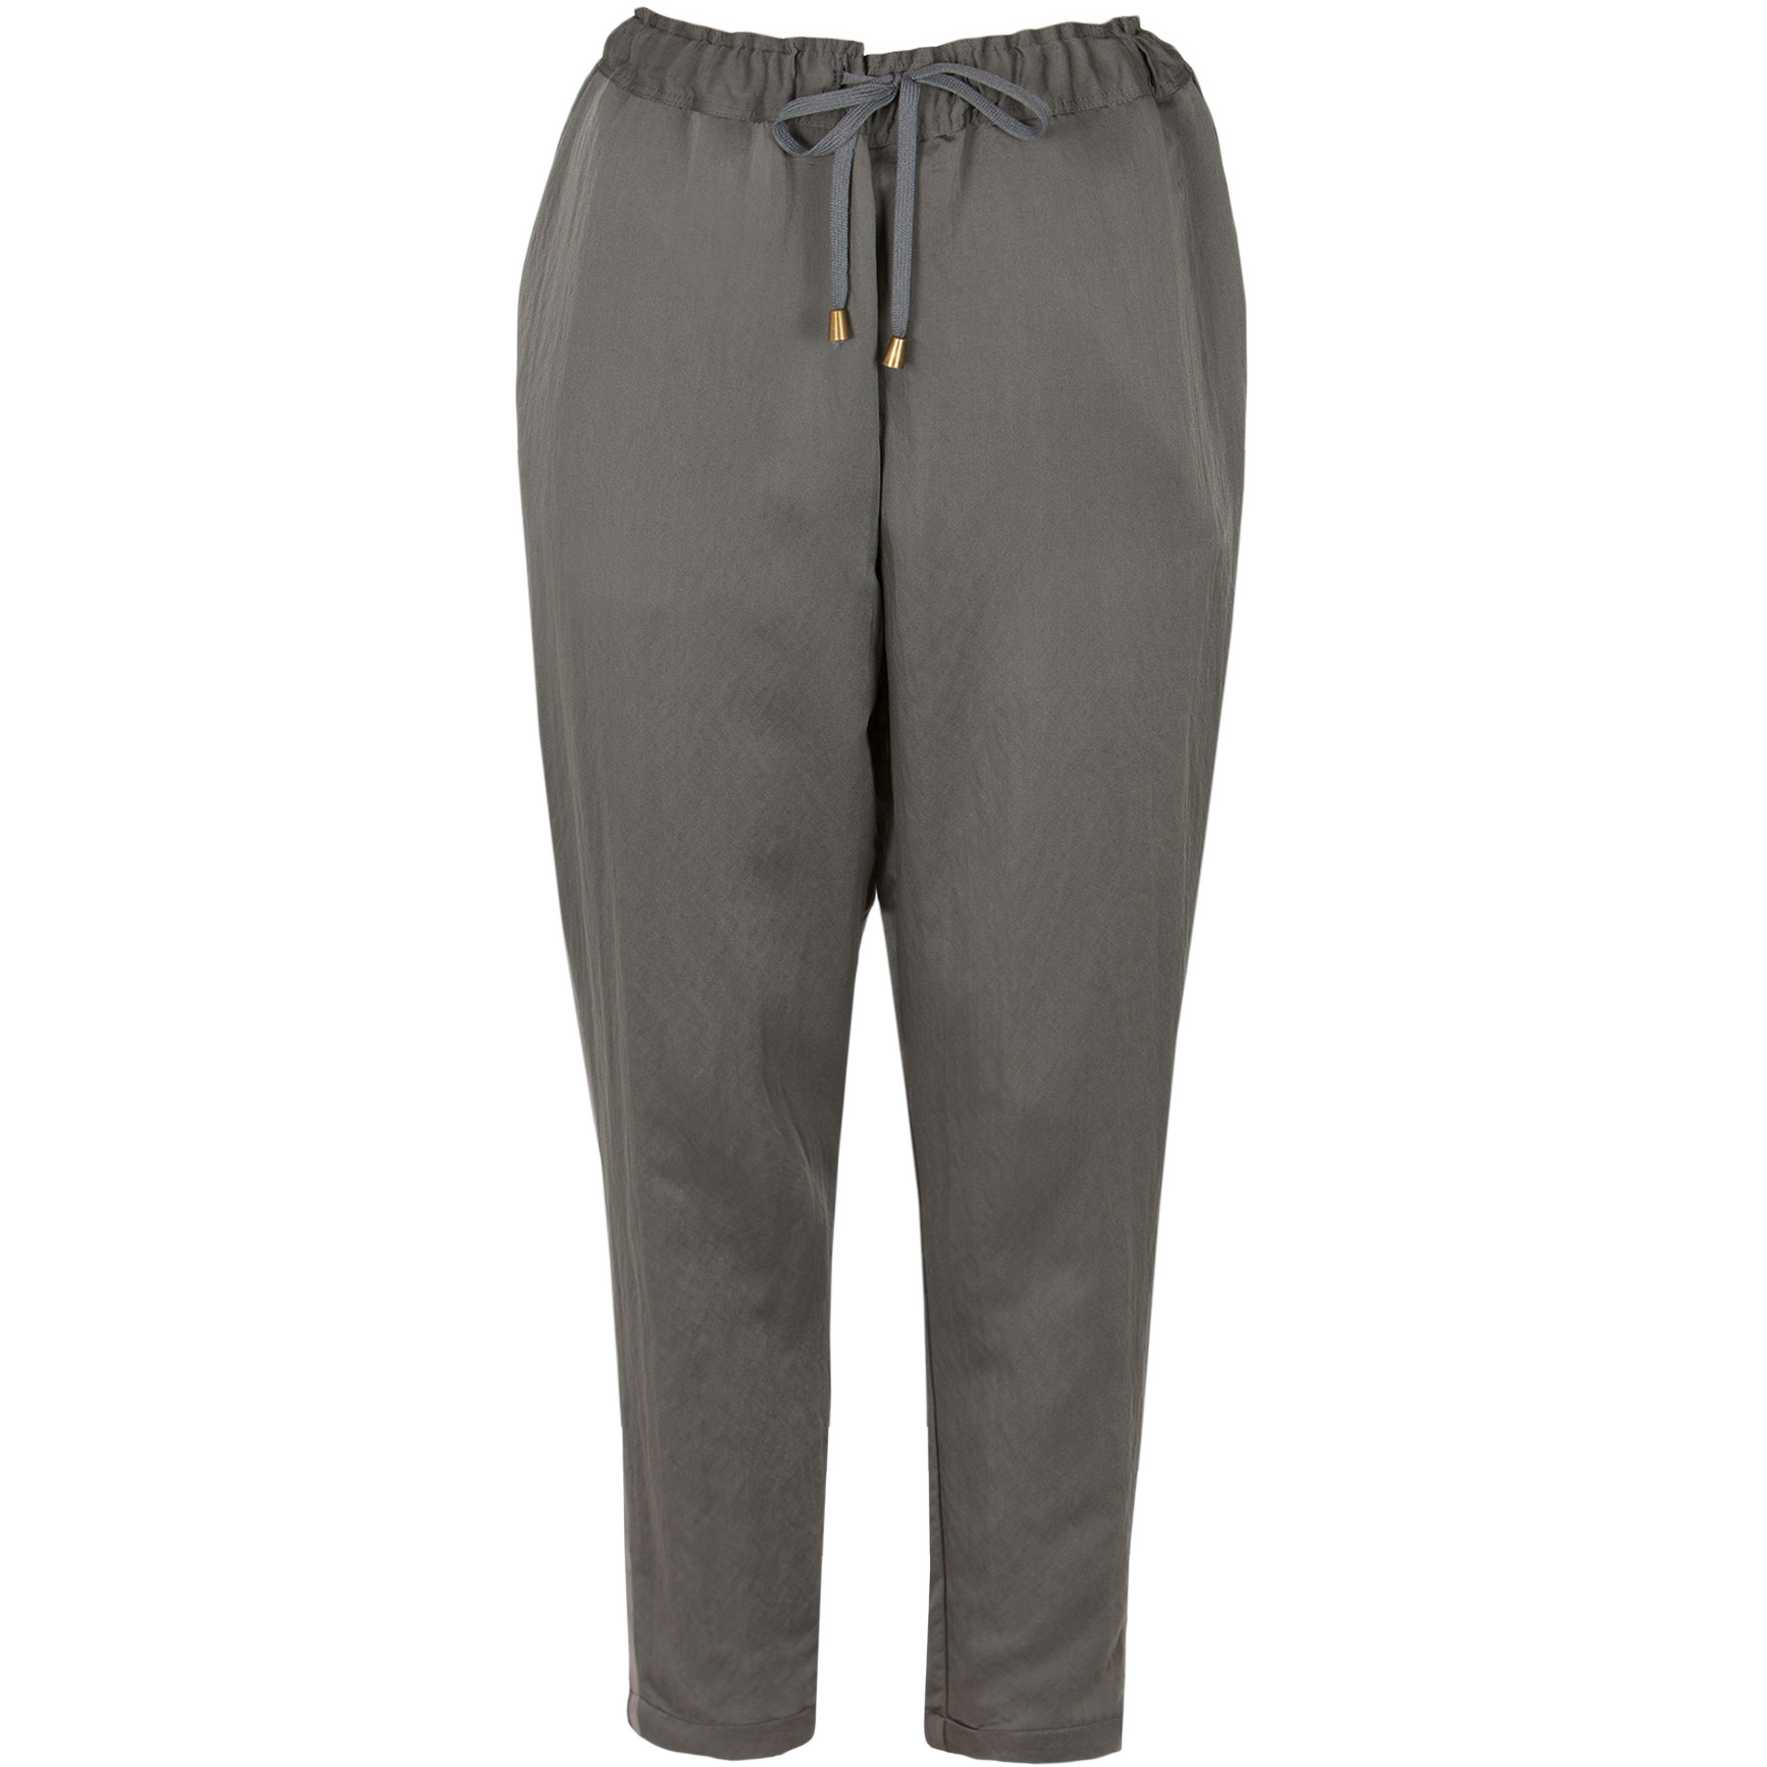 Pantaloni gri cu snur model D1704